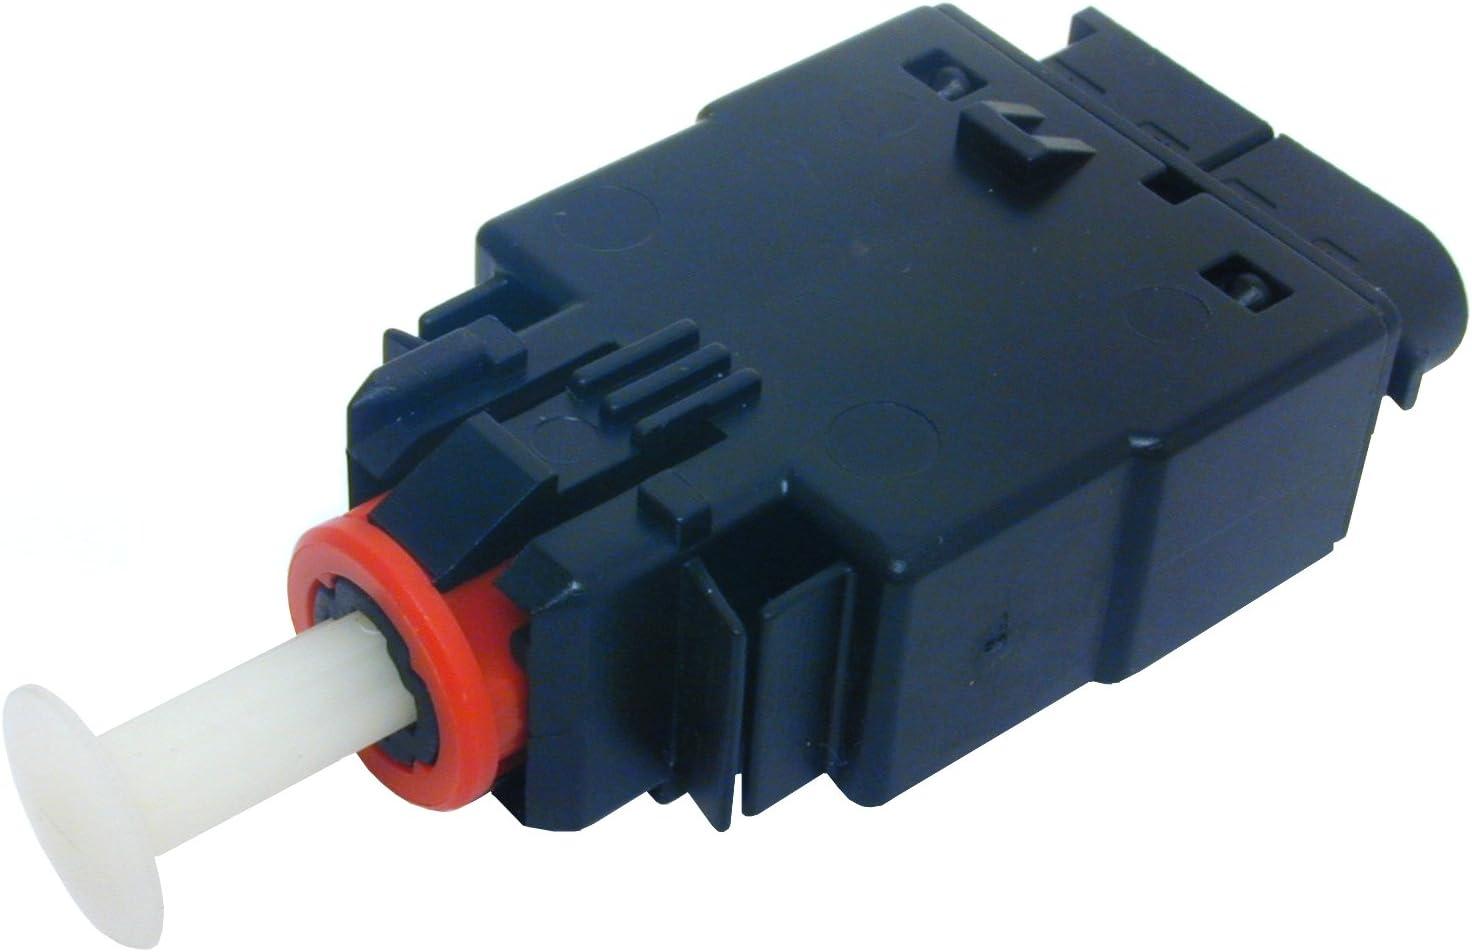 URO Parts 61 31 8 360 417 Brake Light Switch